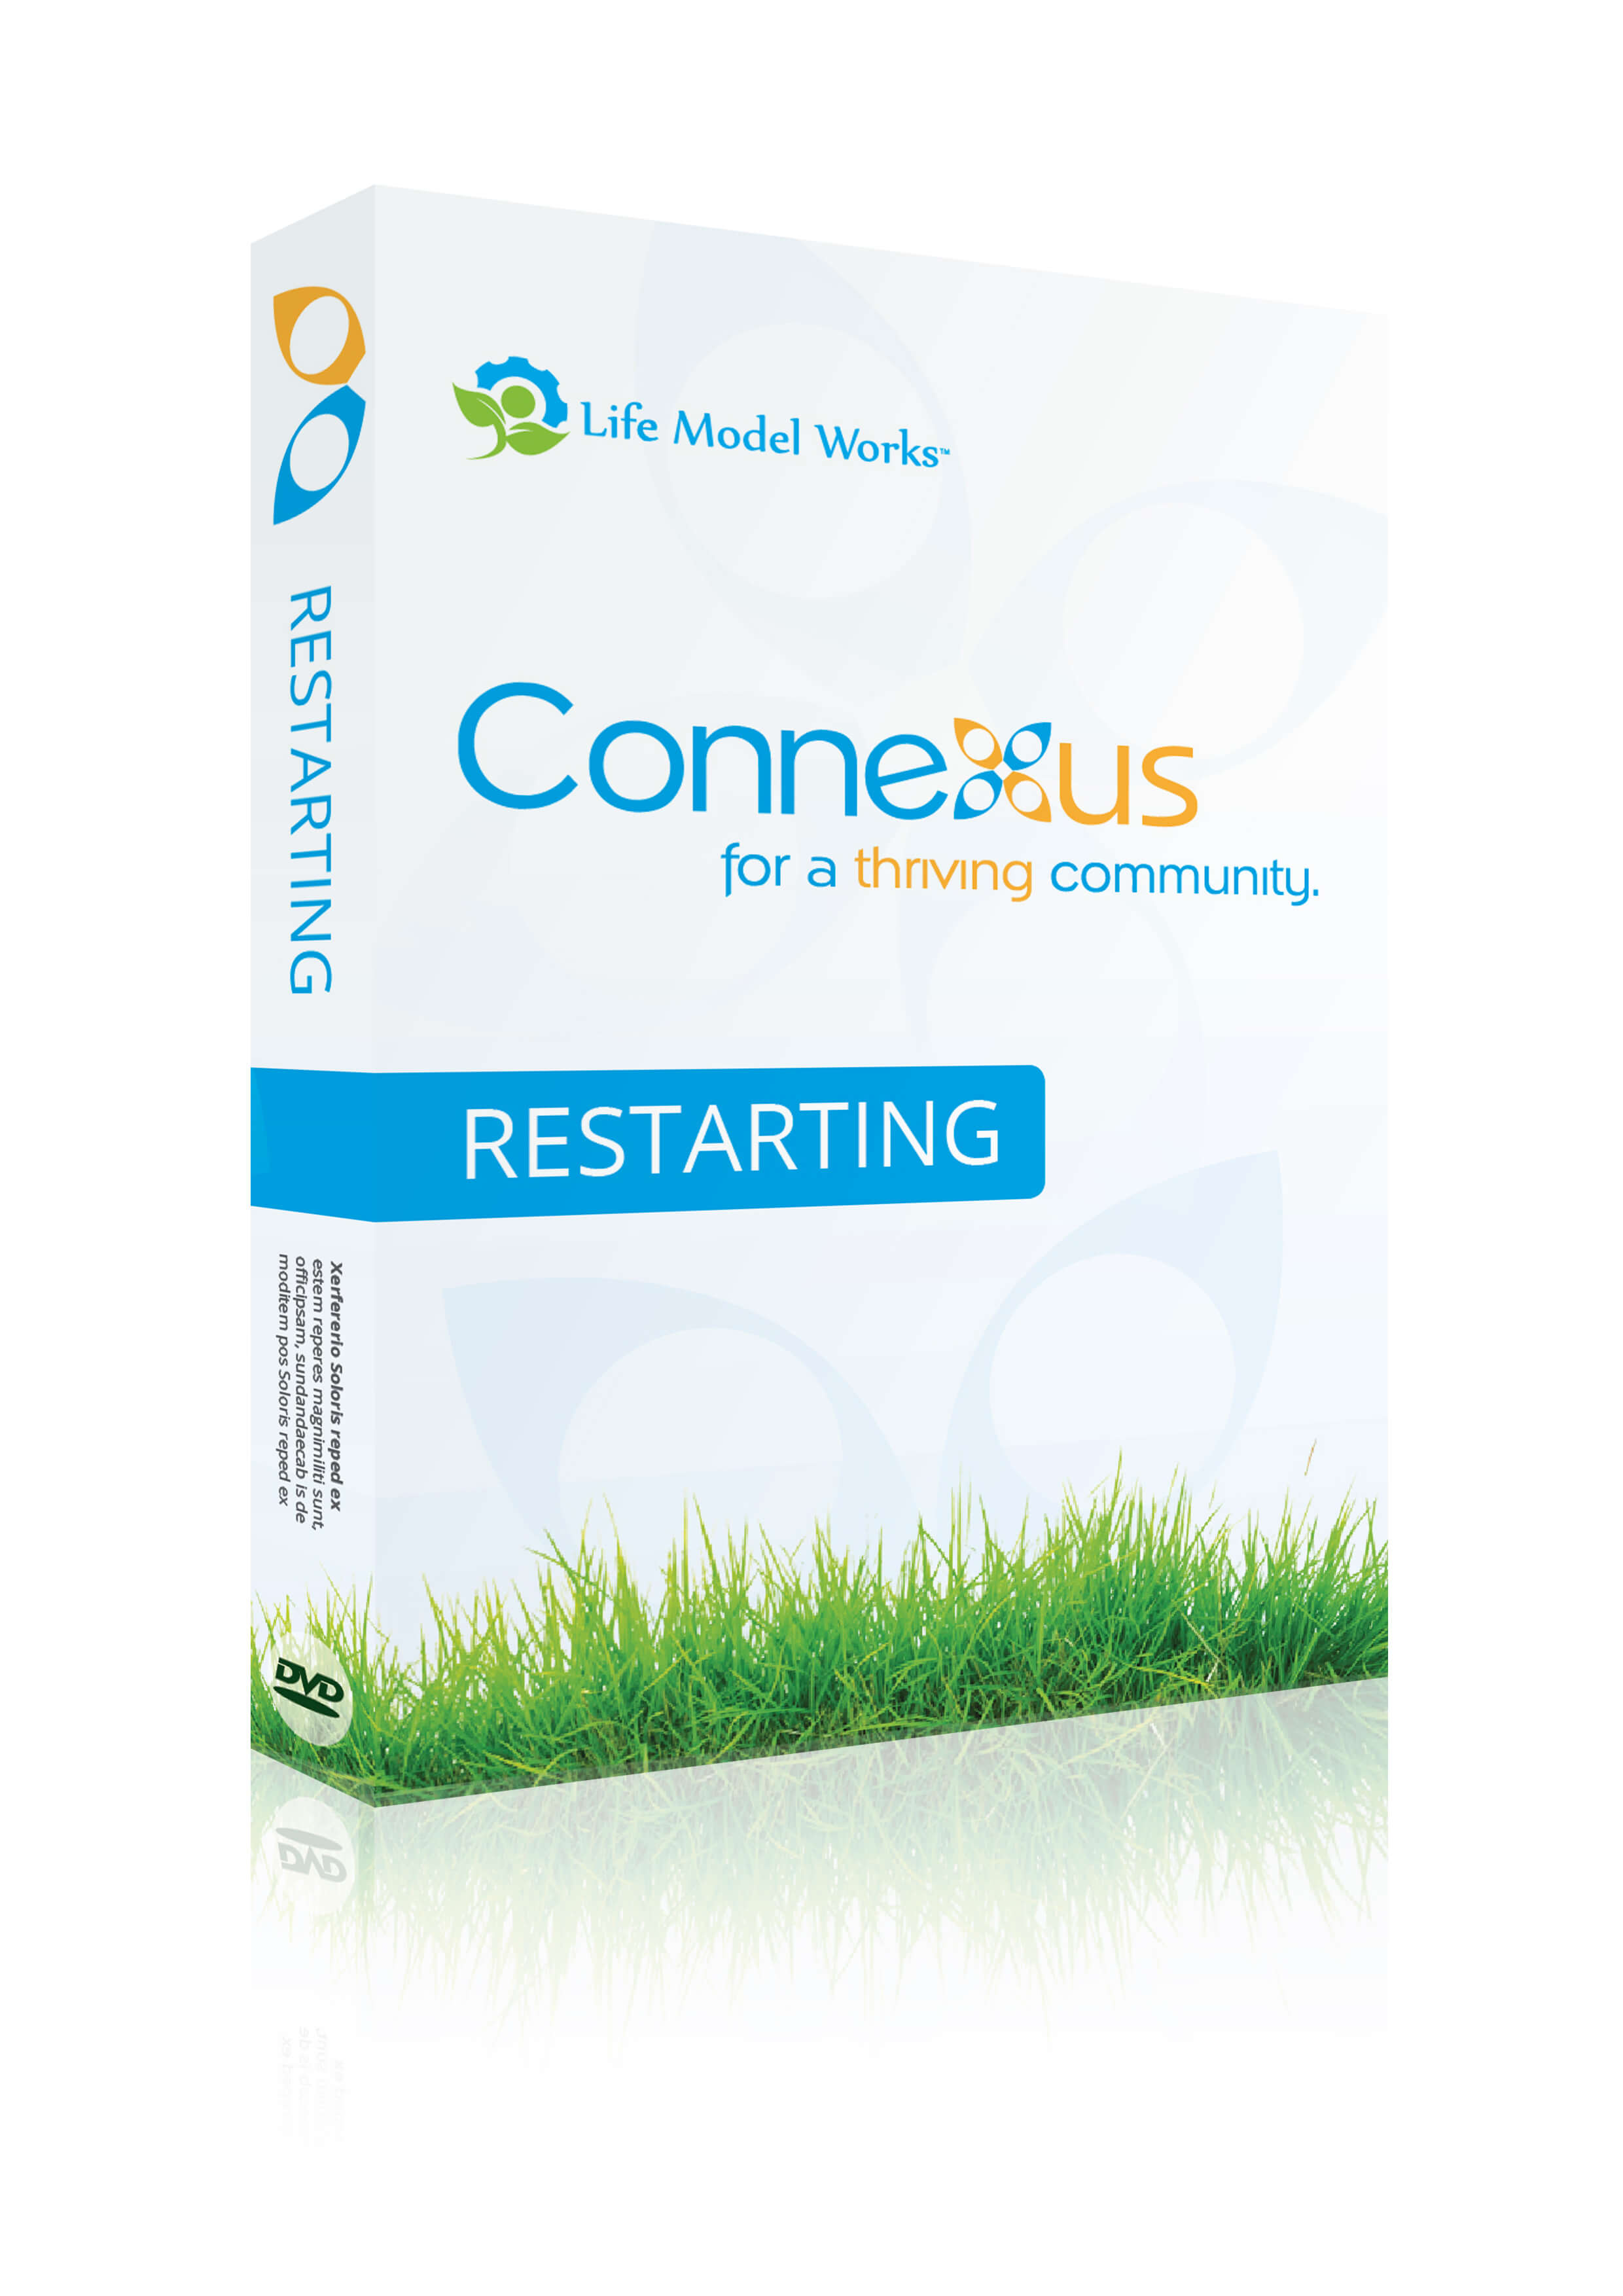 connexus restarting